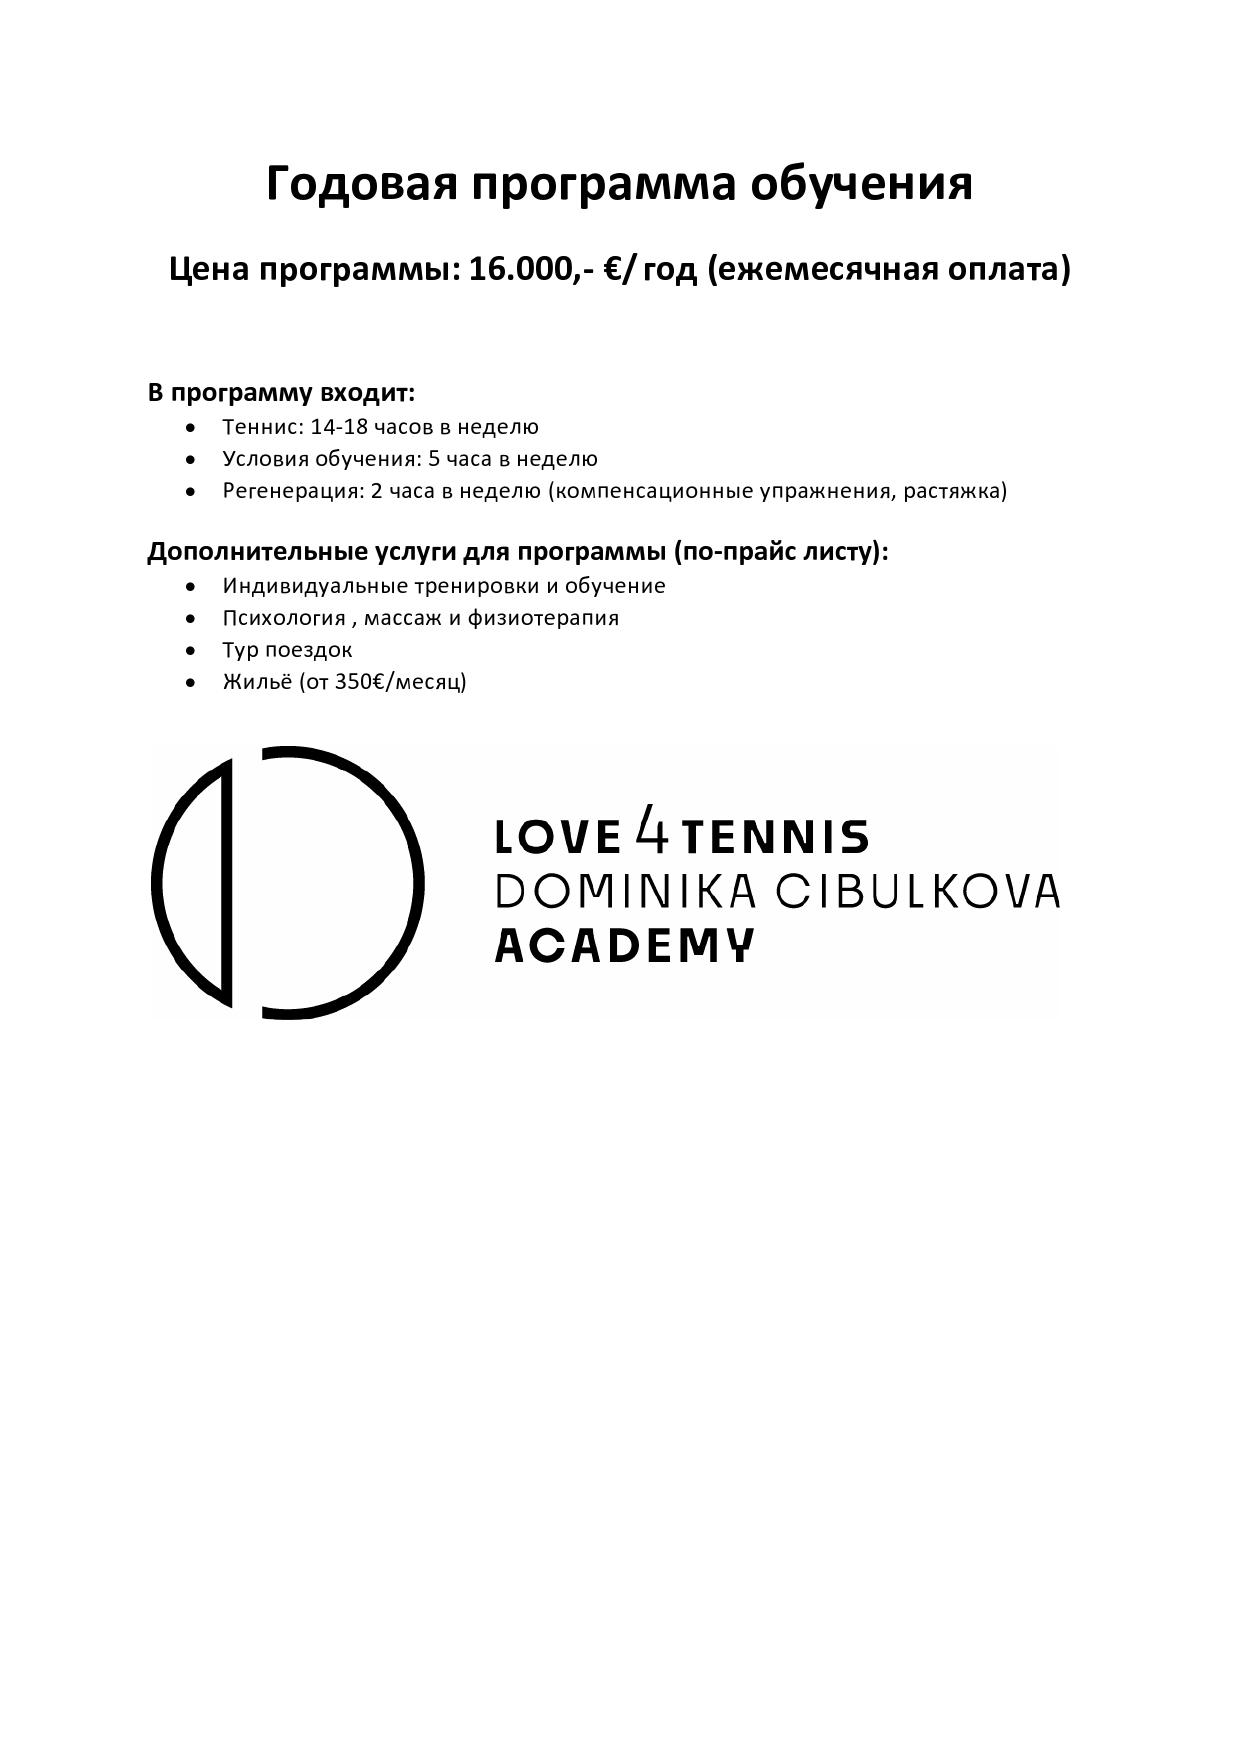 Rocny RUS-page0001